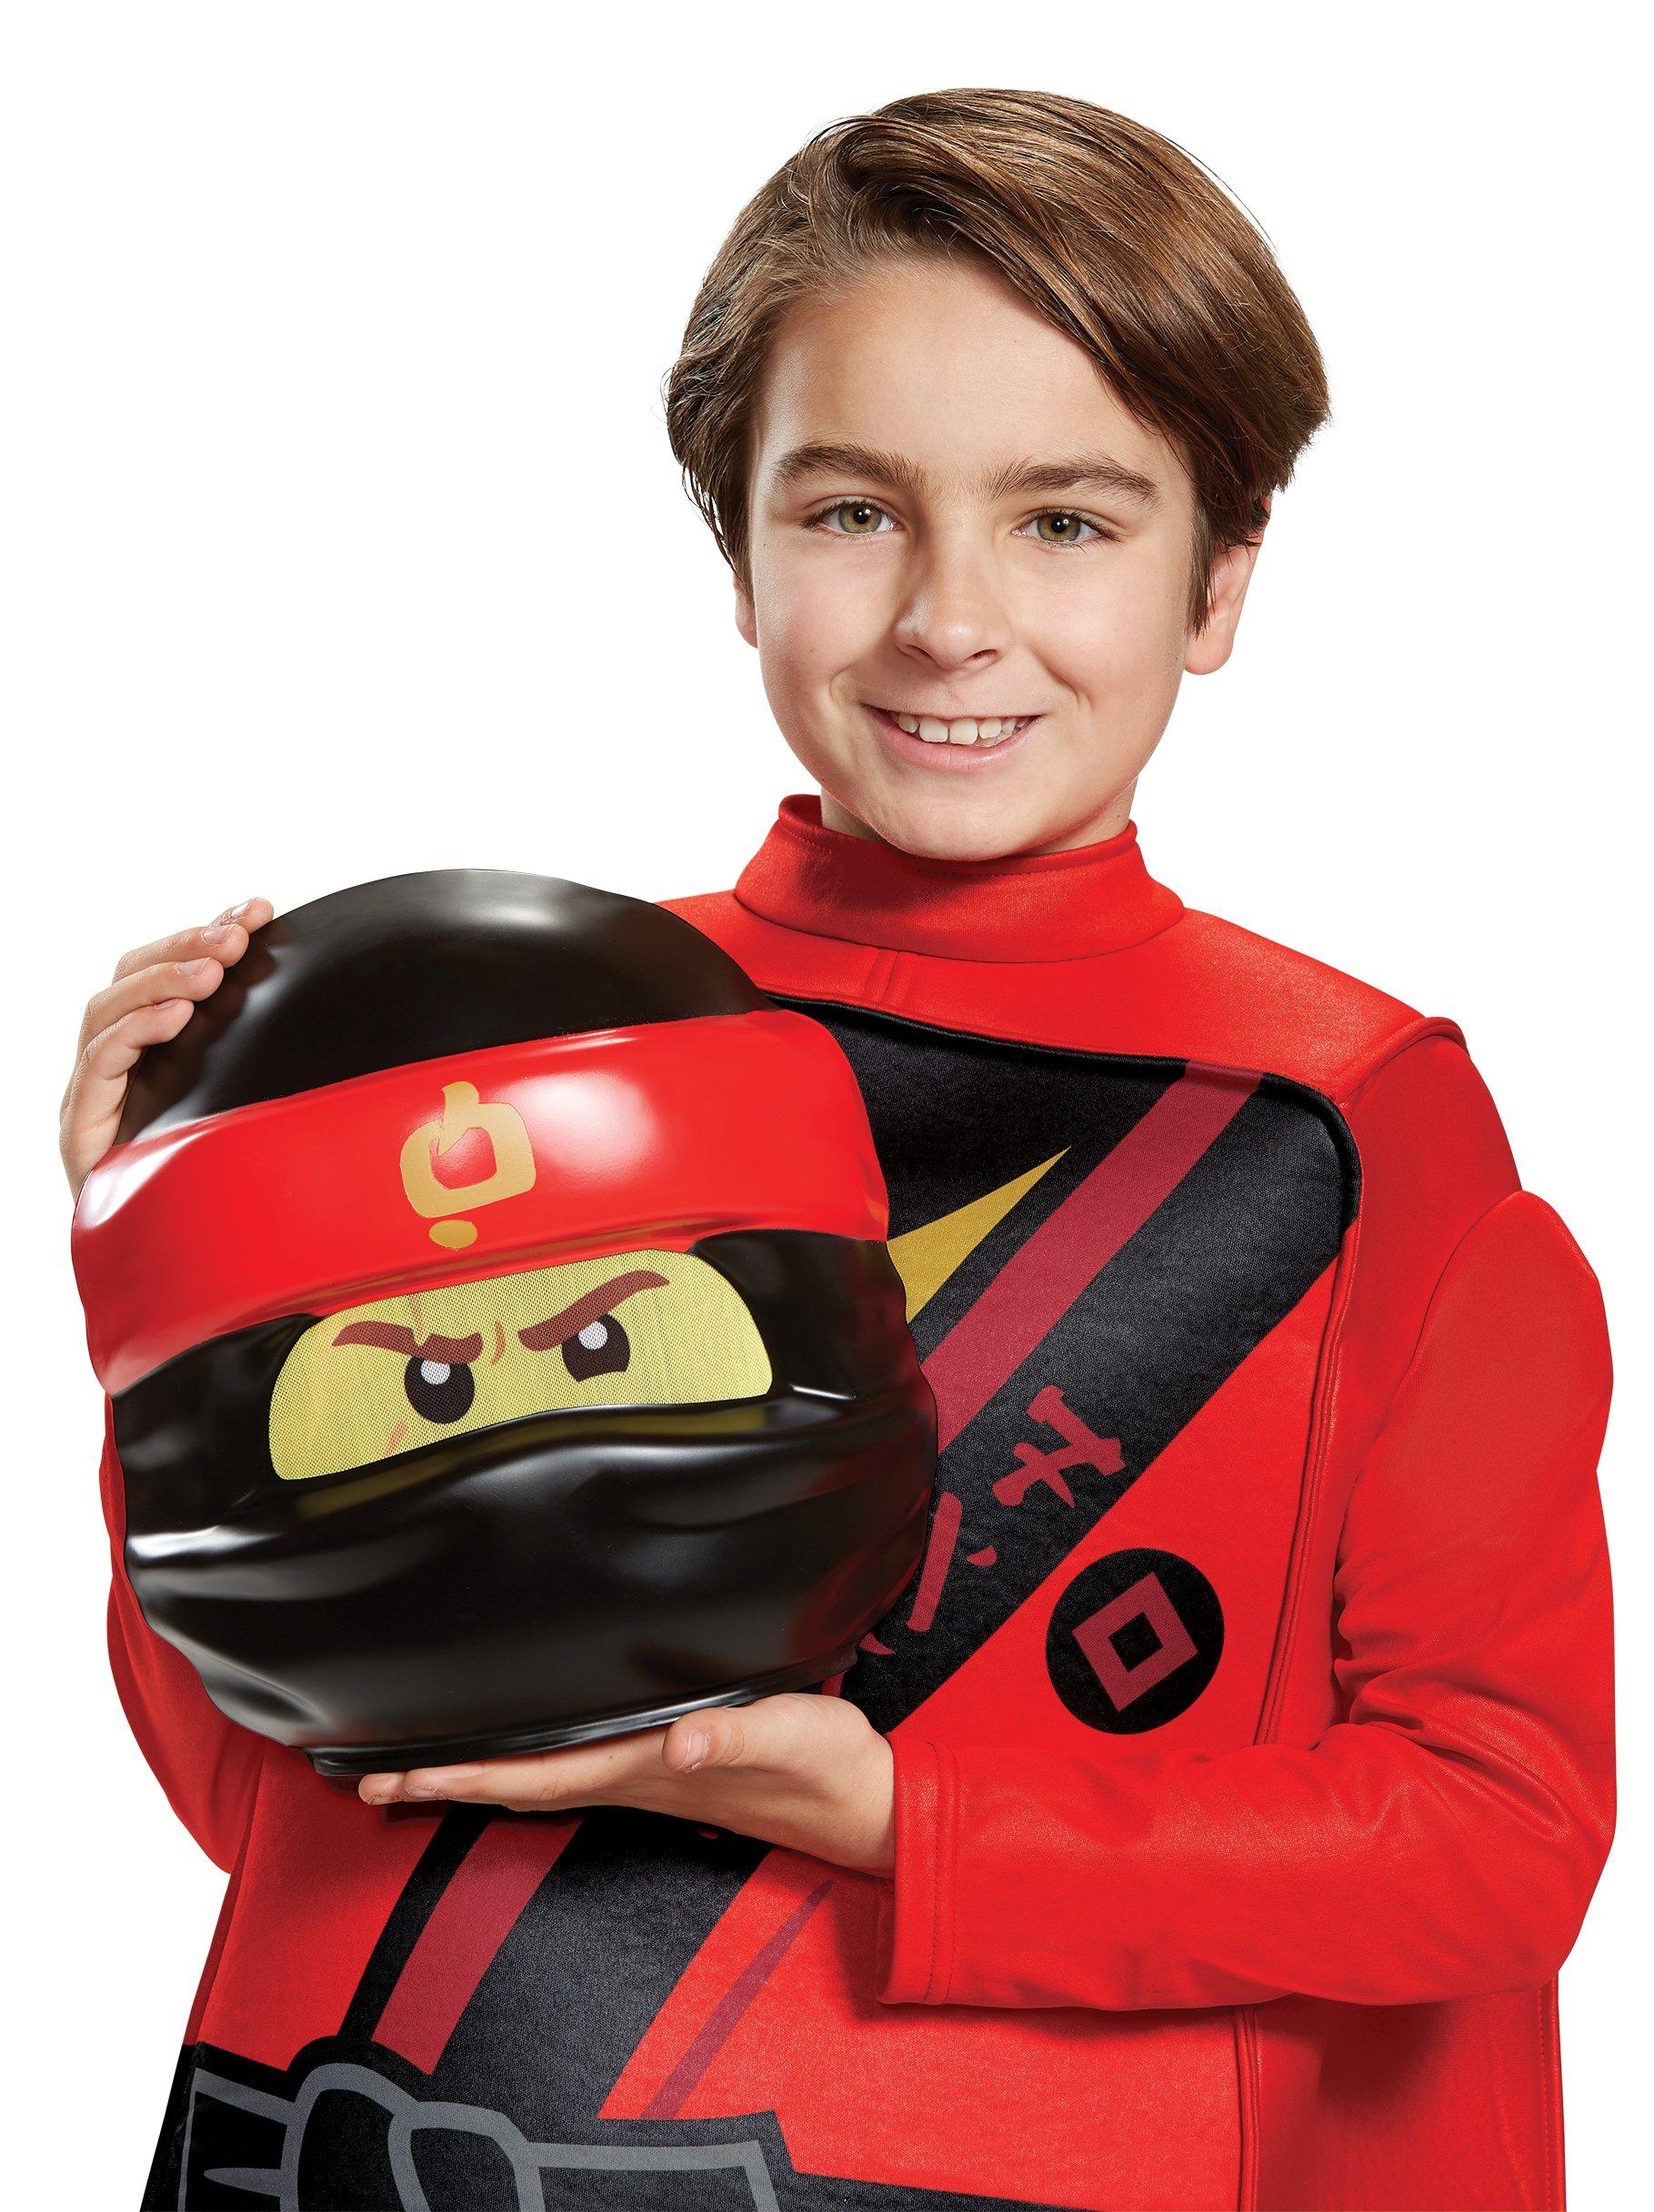 Lego Ninjago Kai 23480K Movie Classic costume, 7 - 8anni 4 spesavip